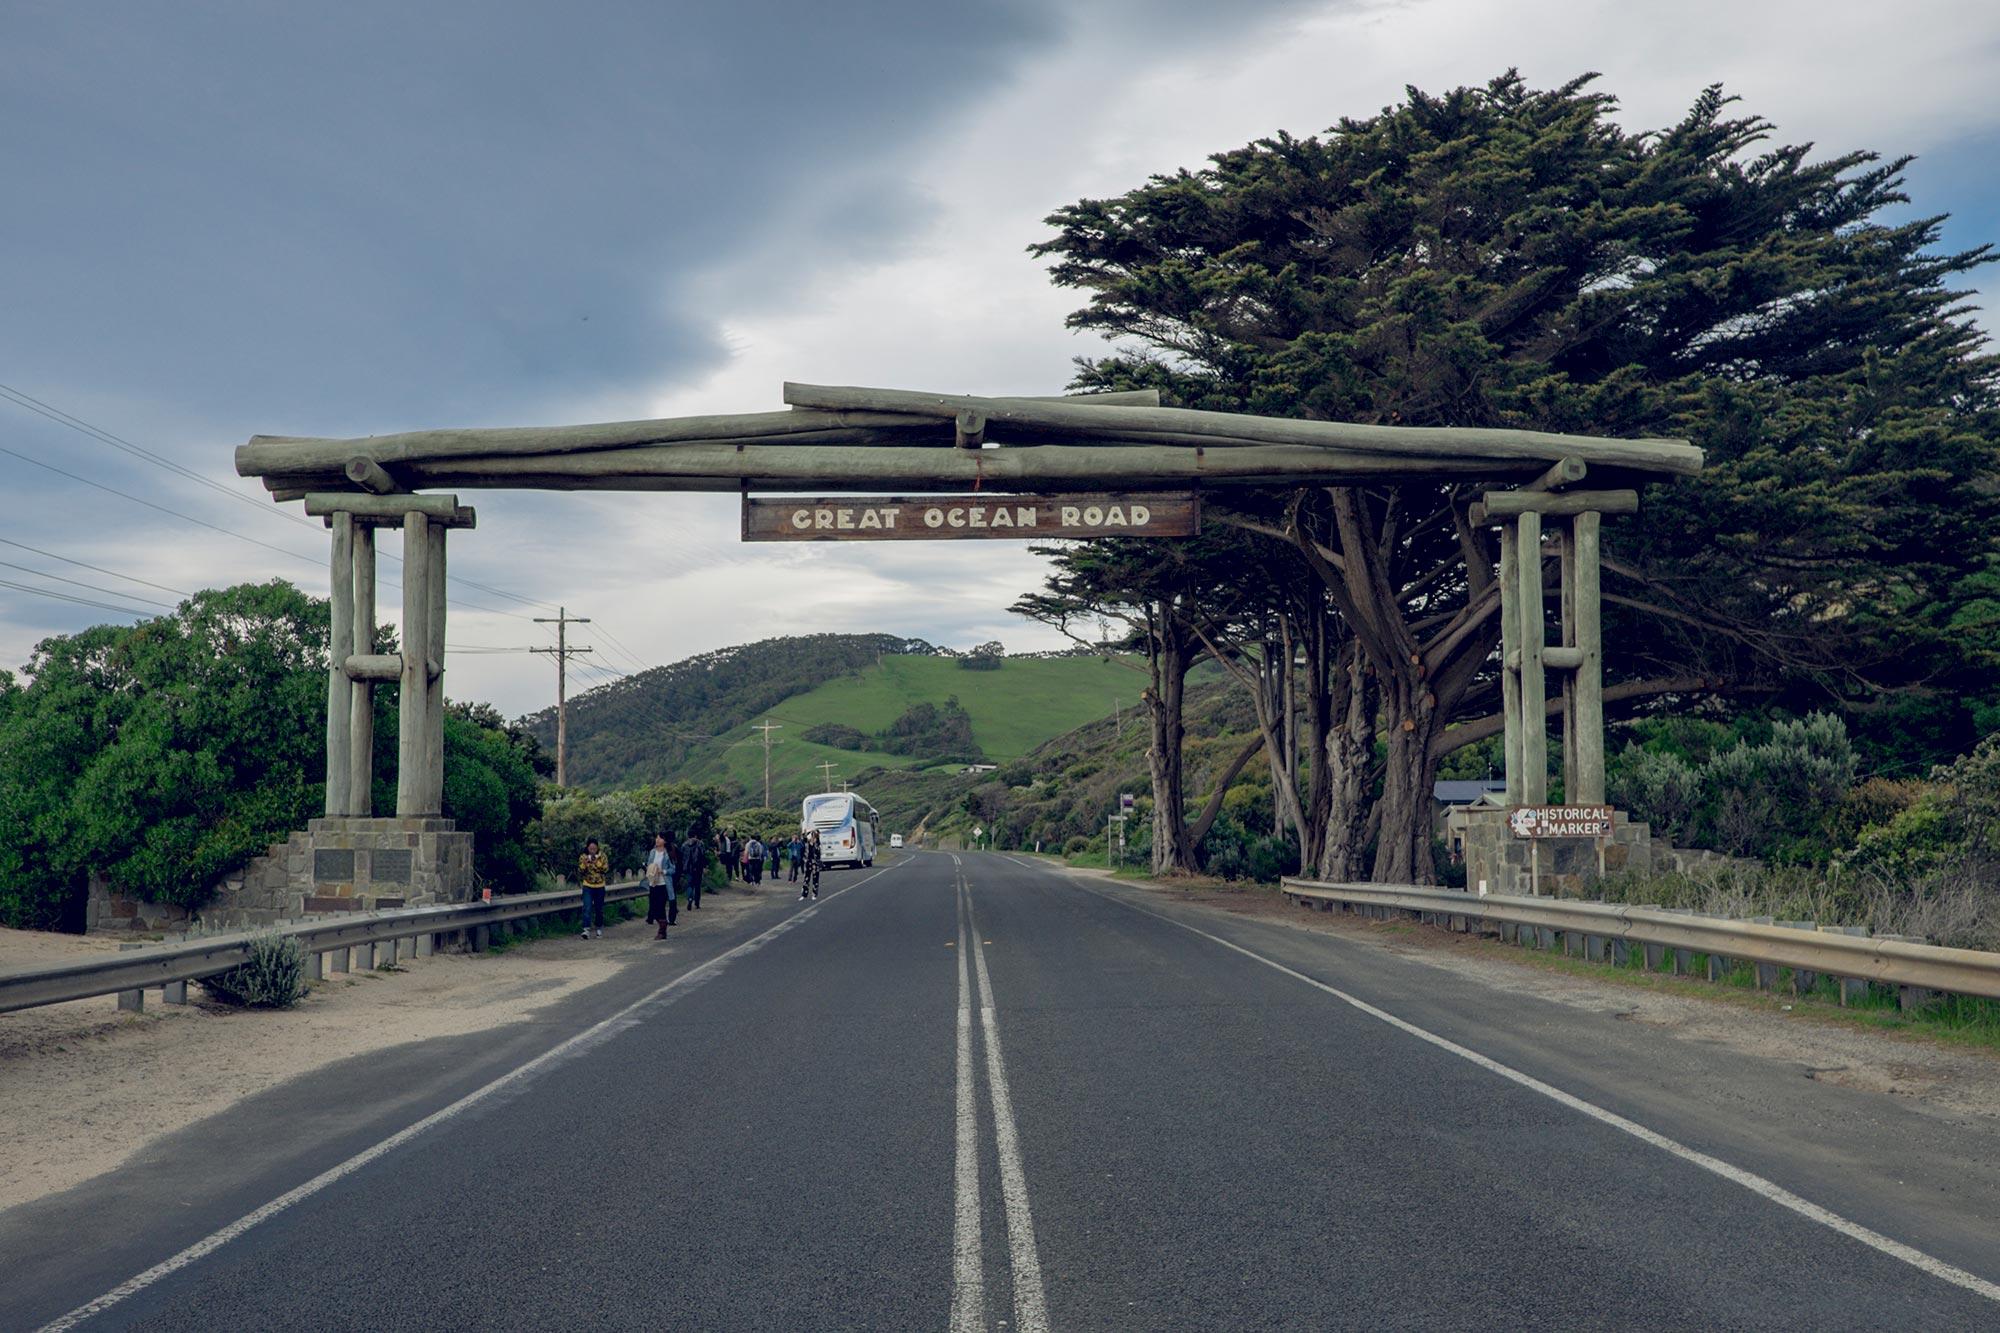 australia-melbourne-great-ocean-road-memorial-arch2